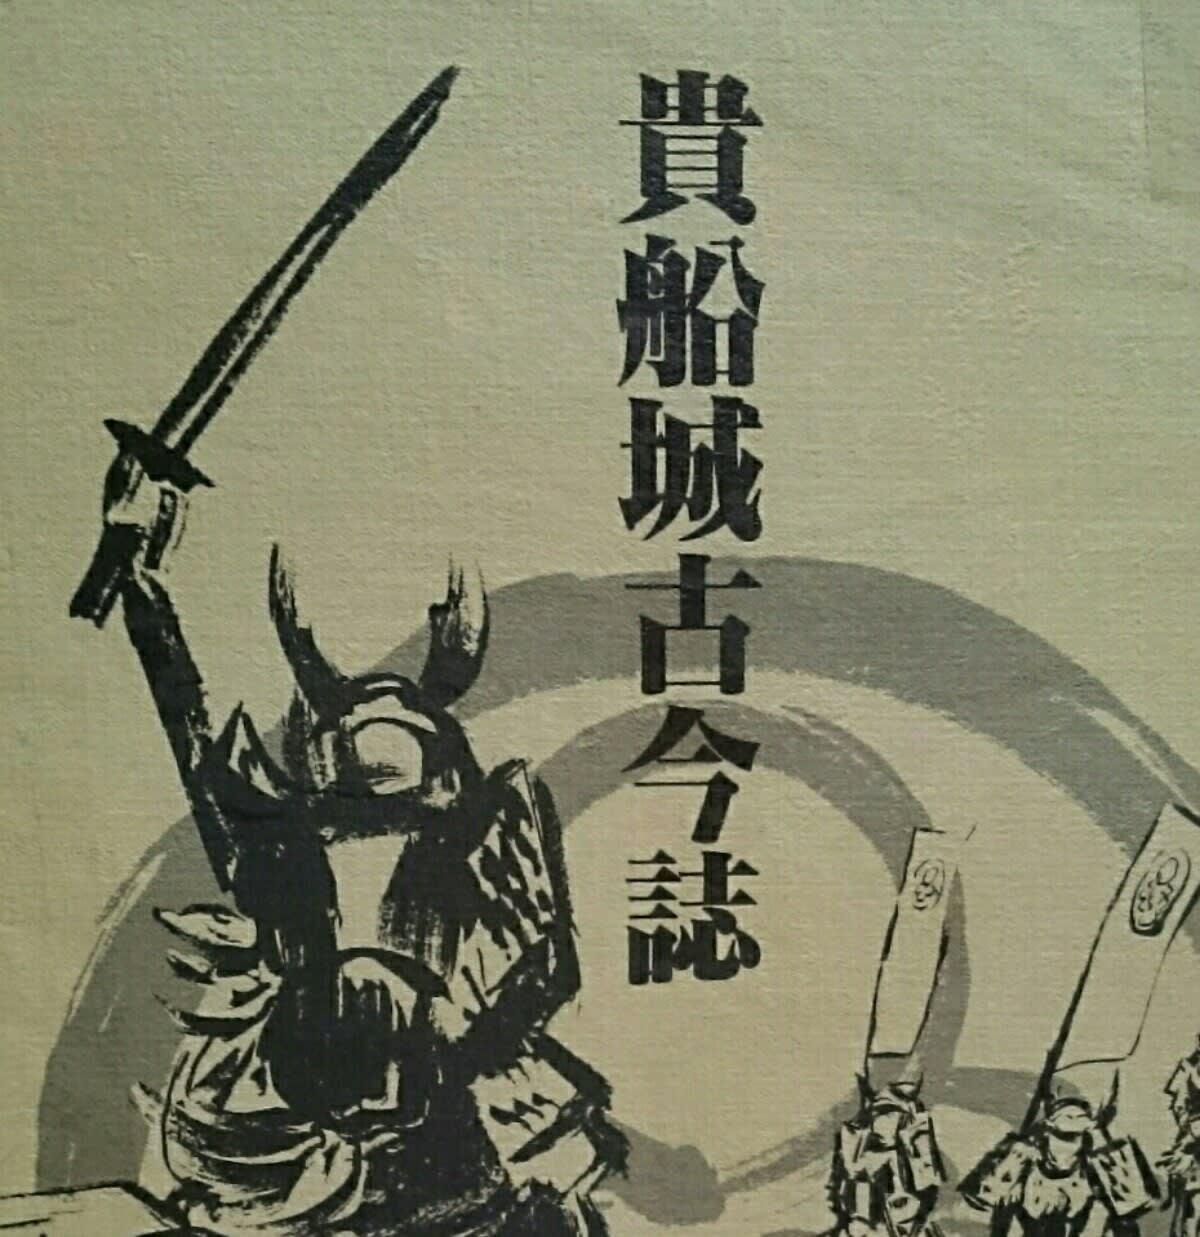 佐々木助三郎の画像 p1_33